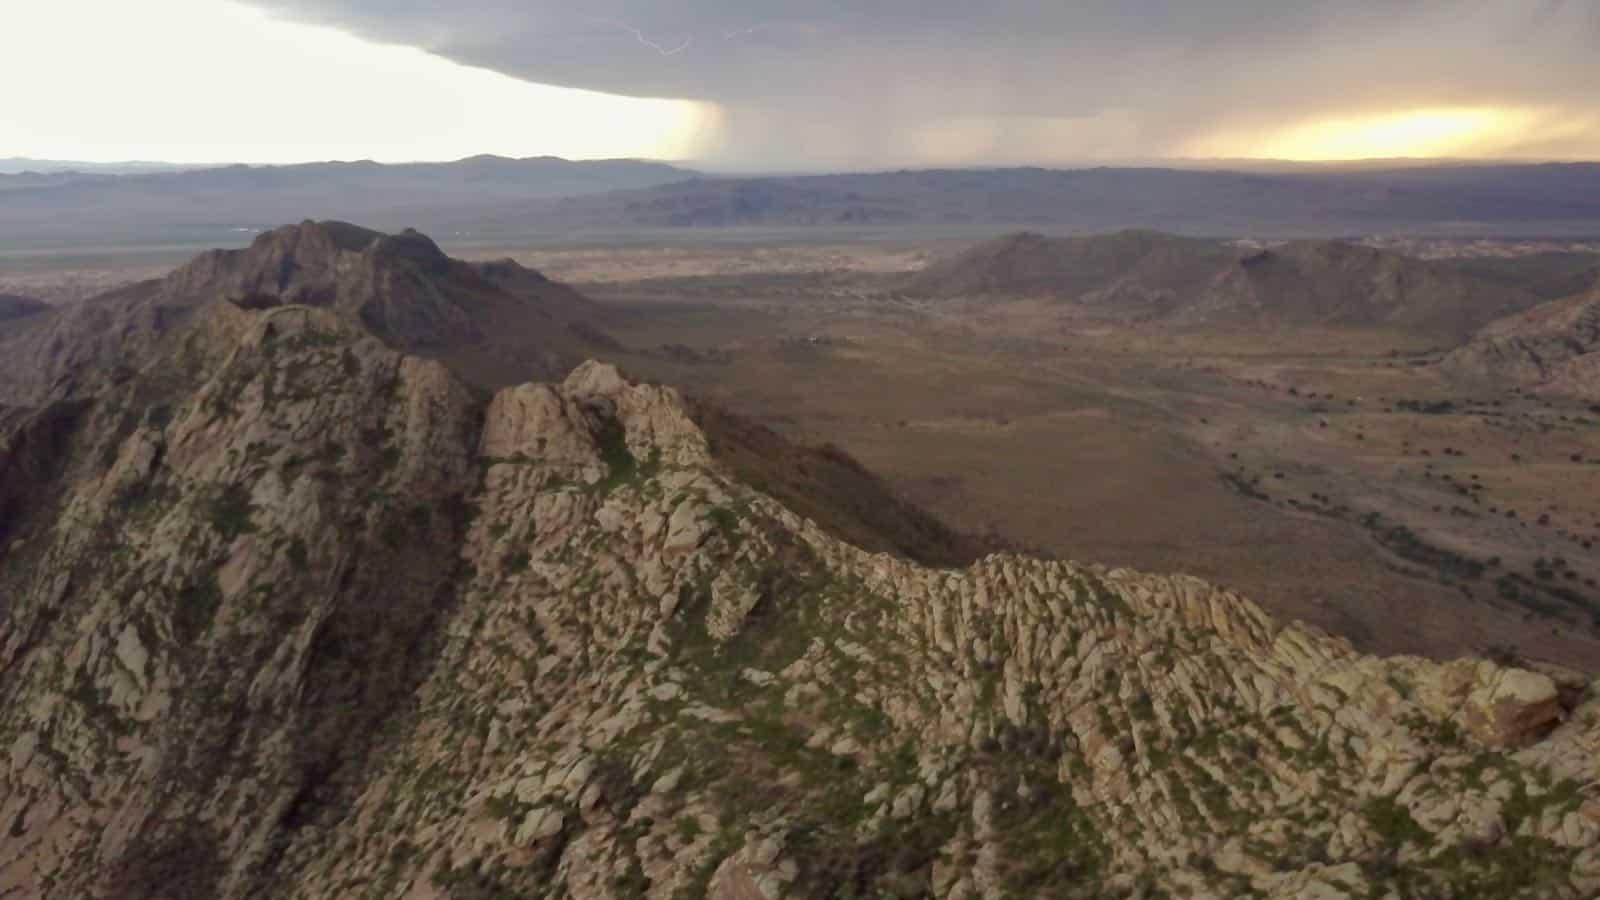 Mavic Pro Drone Mountains Lightening betternotstop Mongolia Nomads